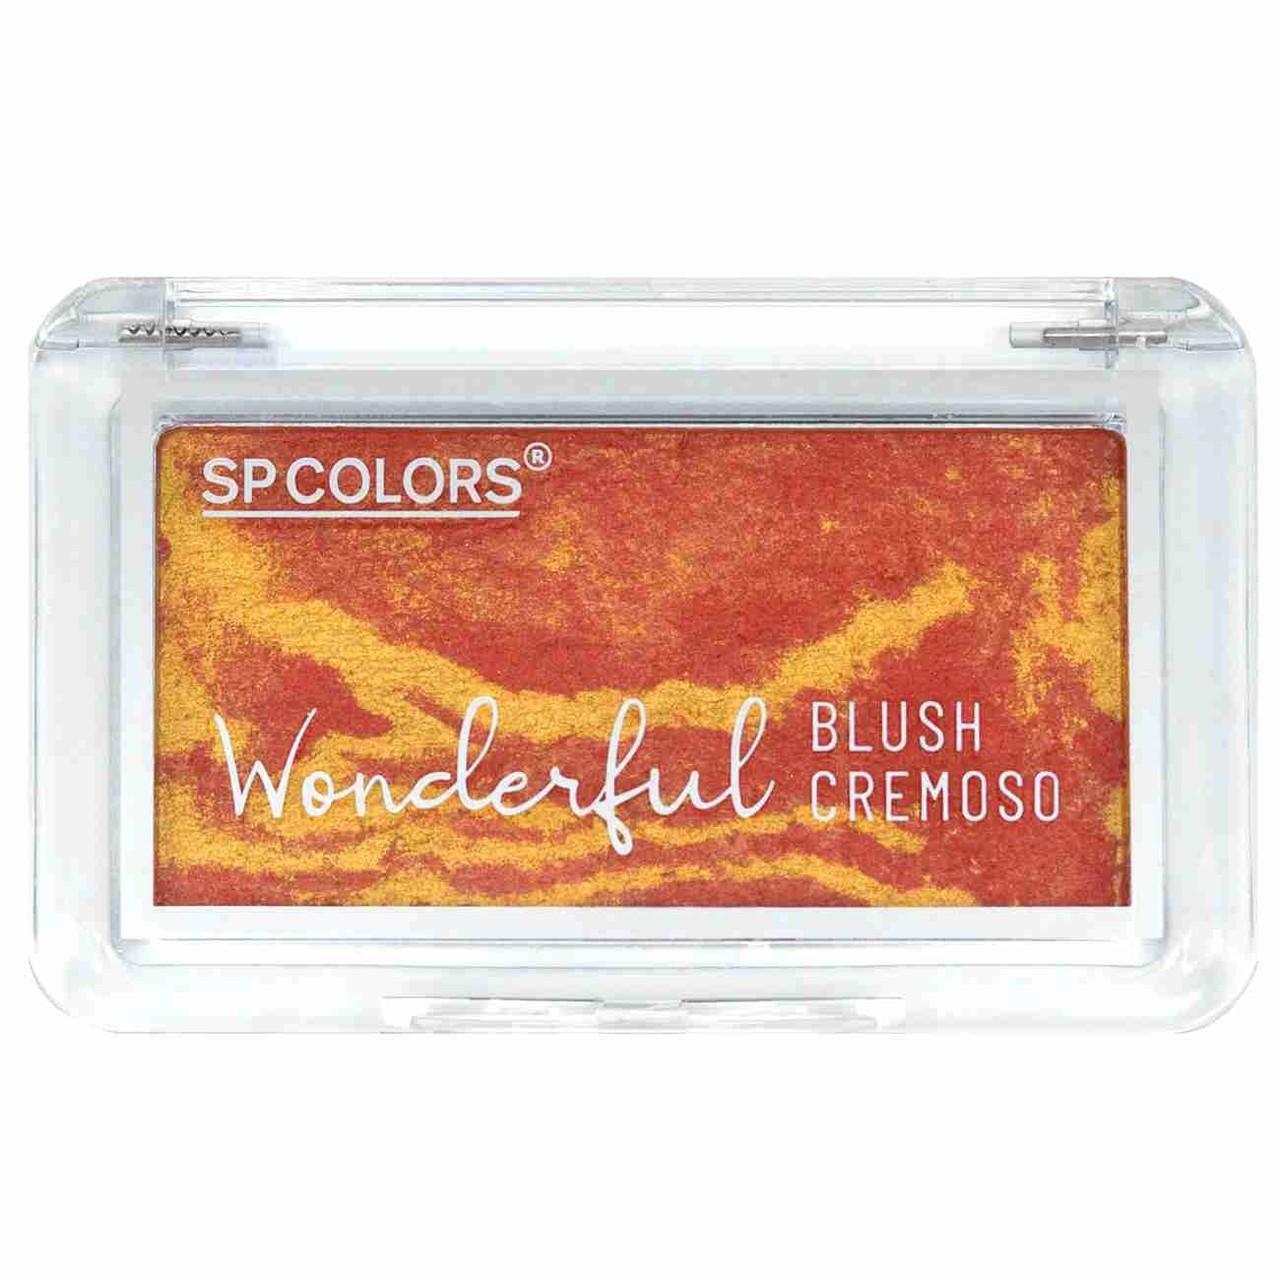 Blush Cremoso SP Colors Wonderful